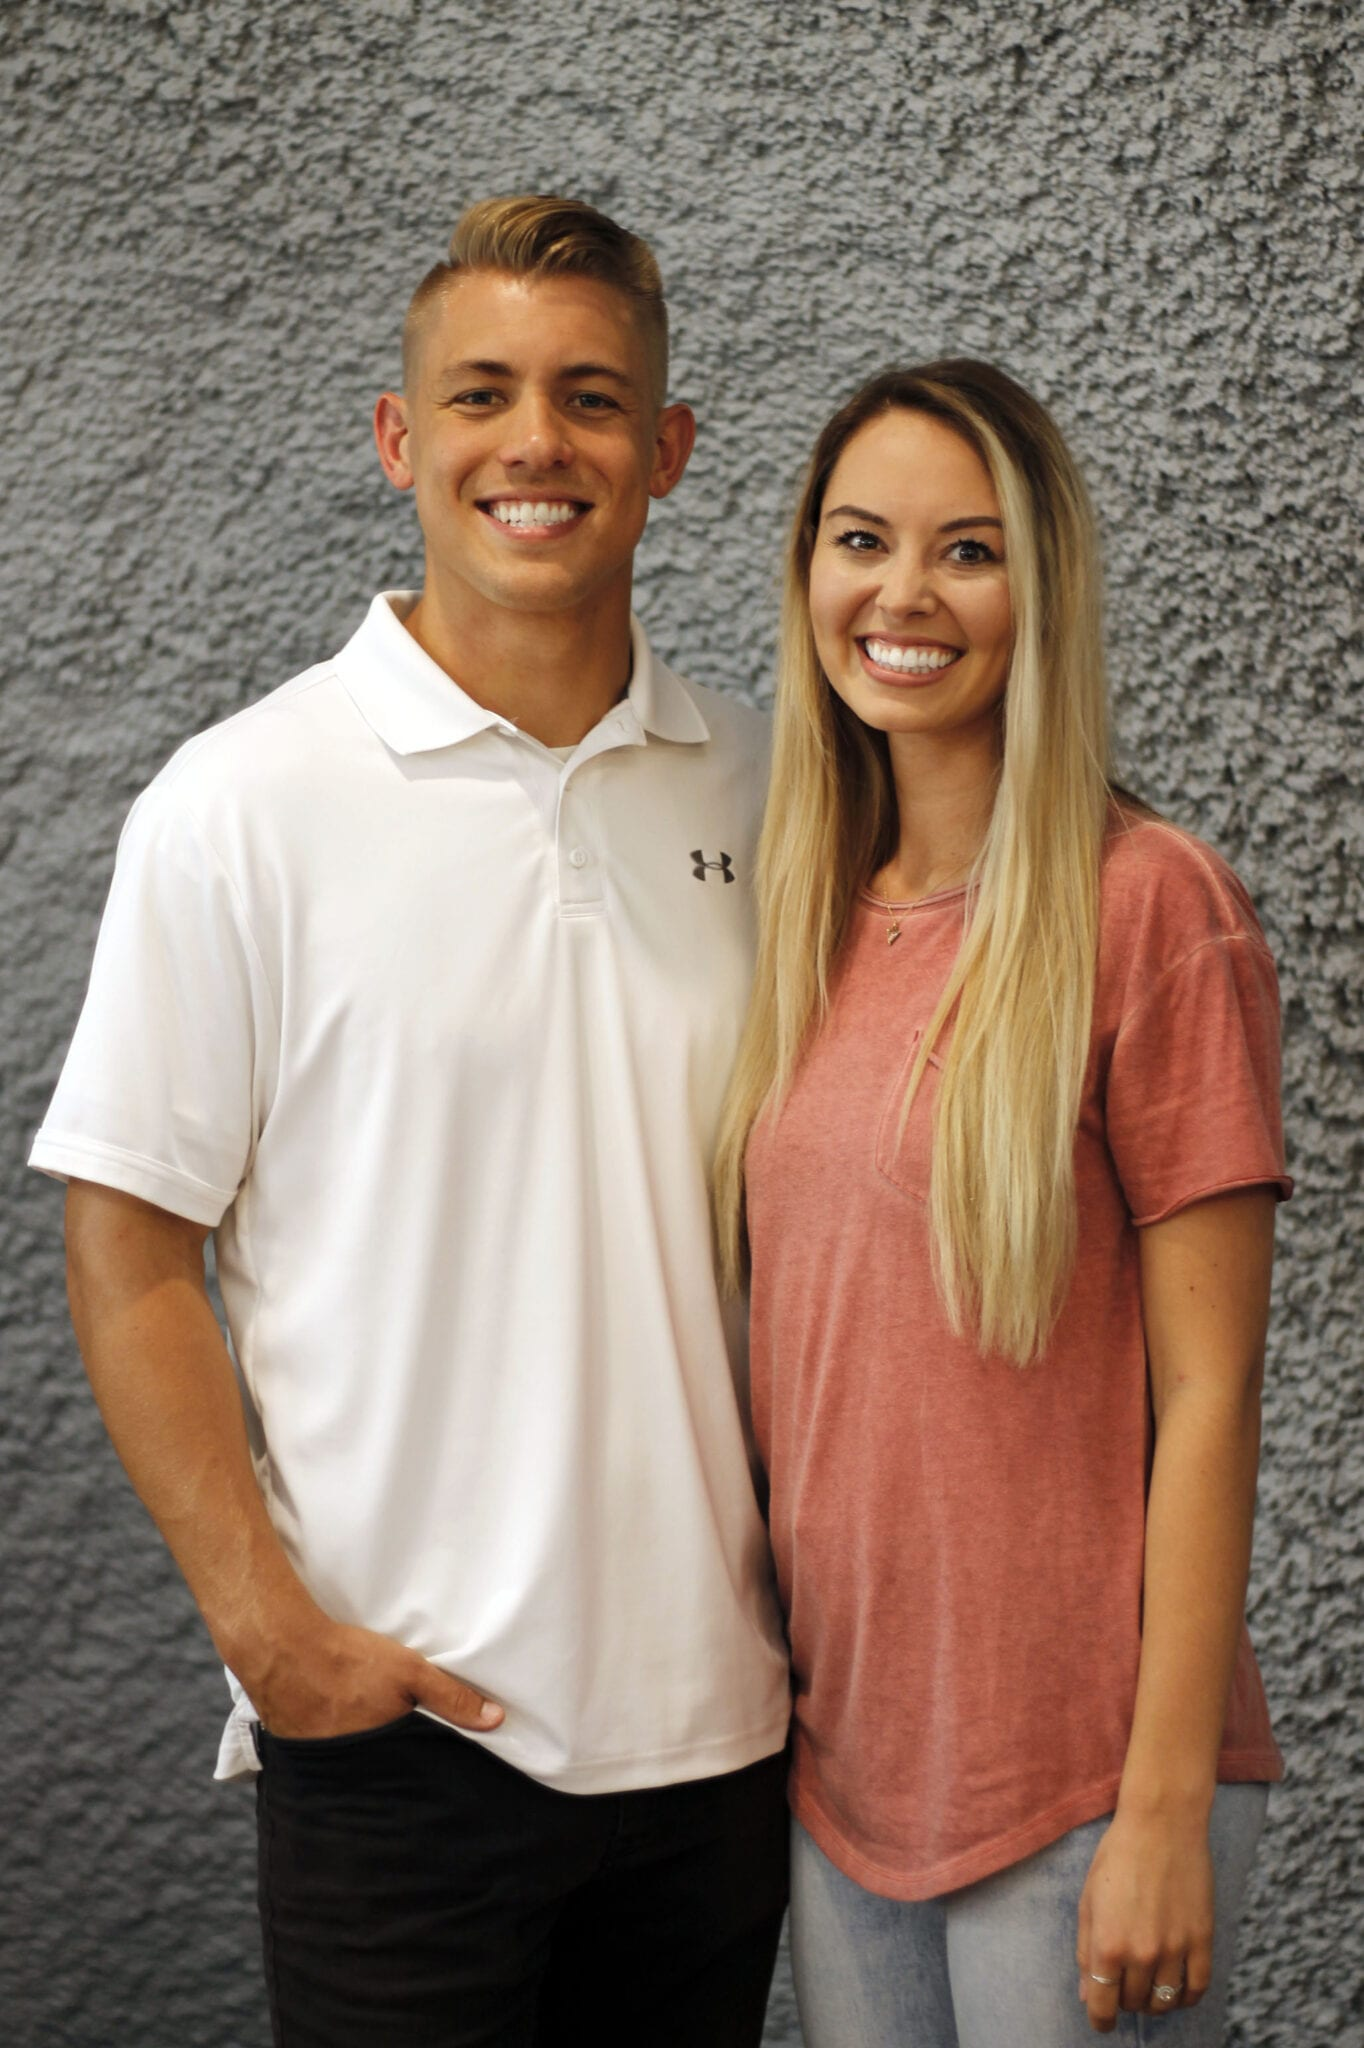 Ryan & Hannah Bruna